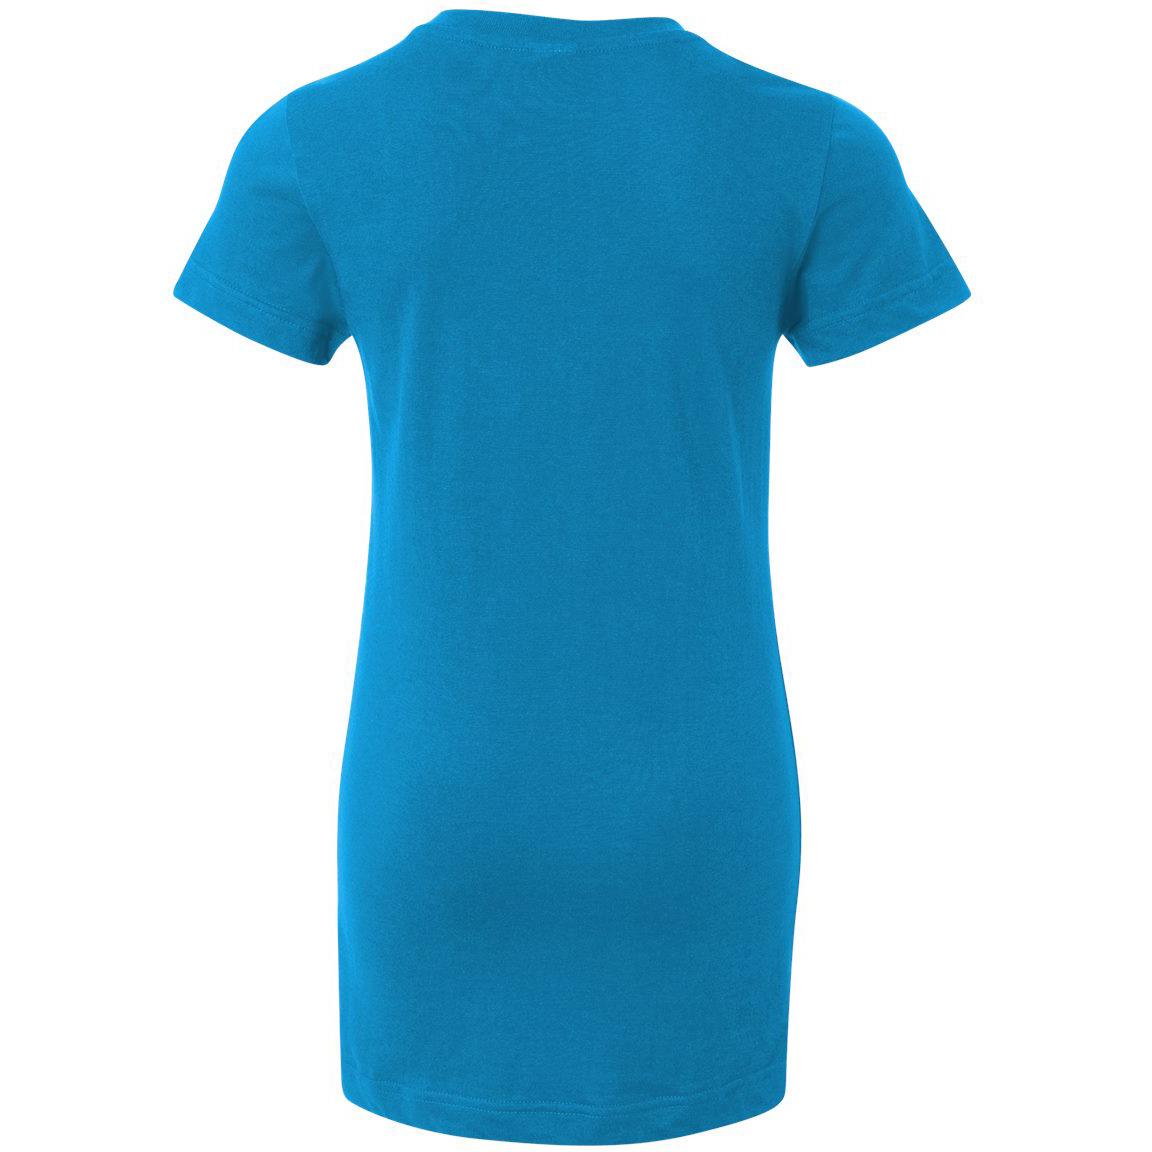 Lat 3607 junior fit fine jersey v neck longer length t for Aqua blue color t shirt